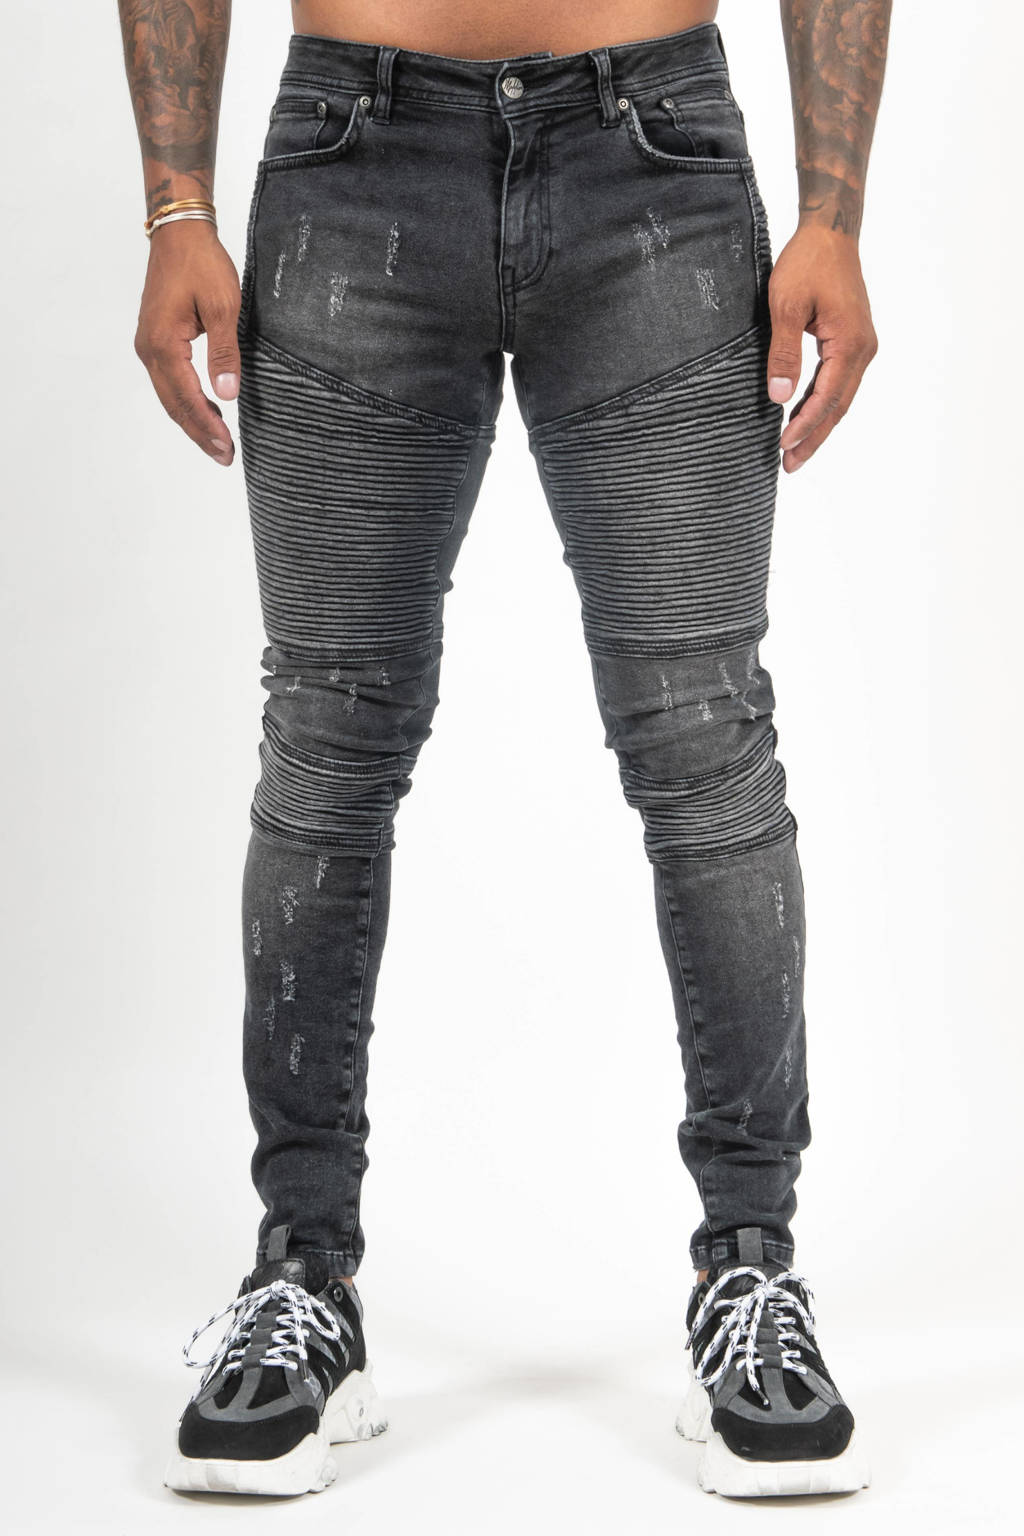 Malelions skinny jeans black, Black